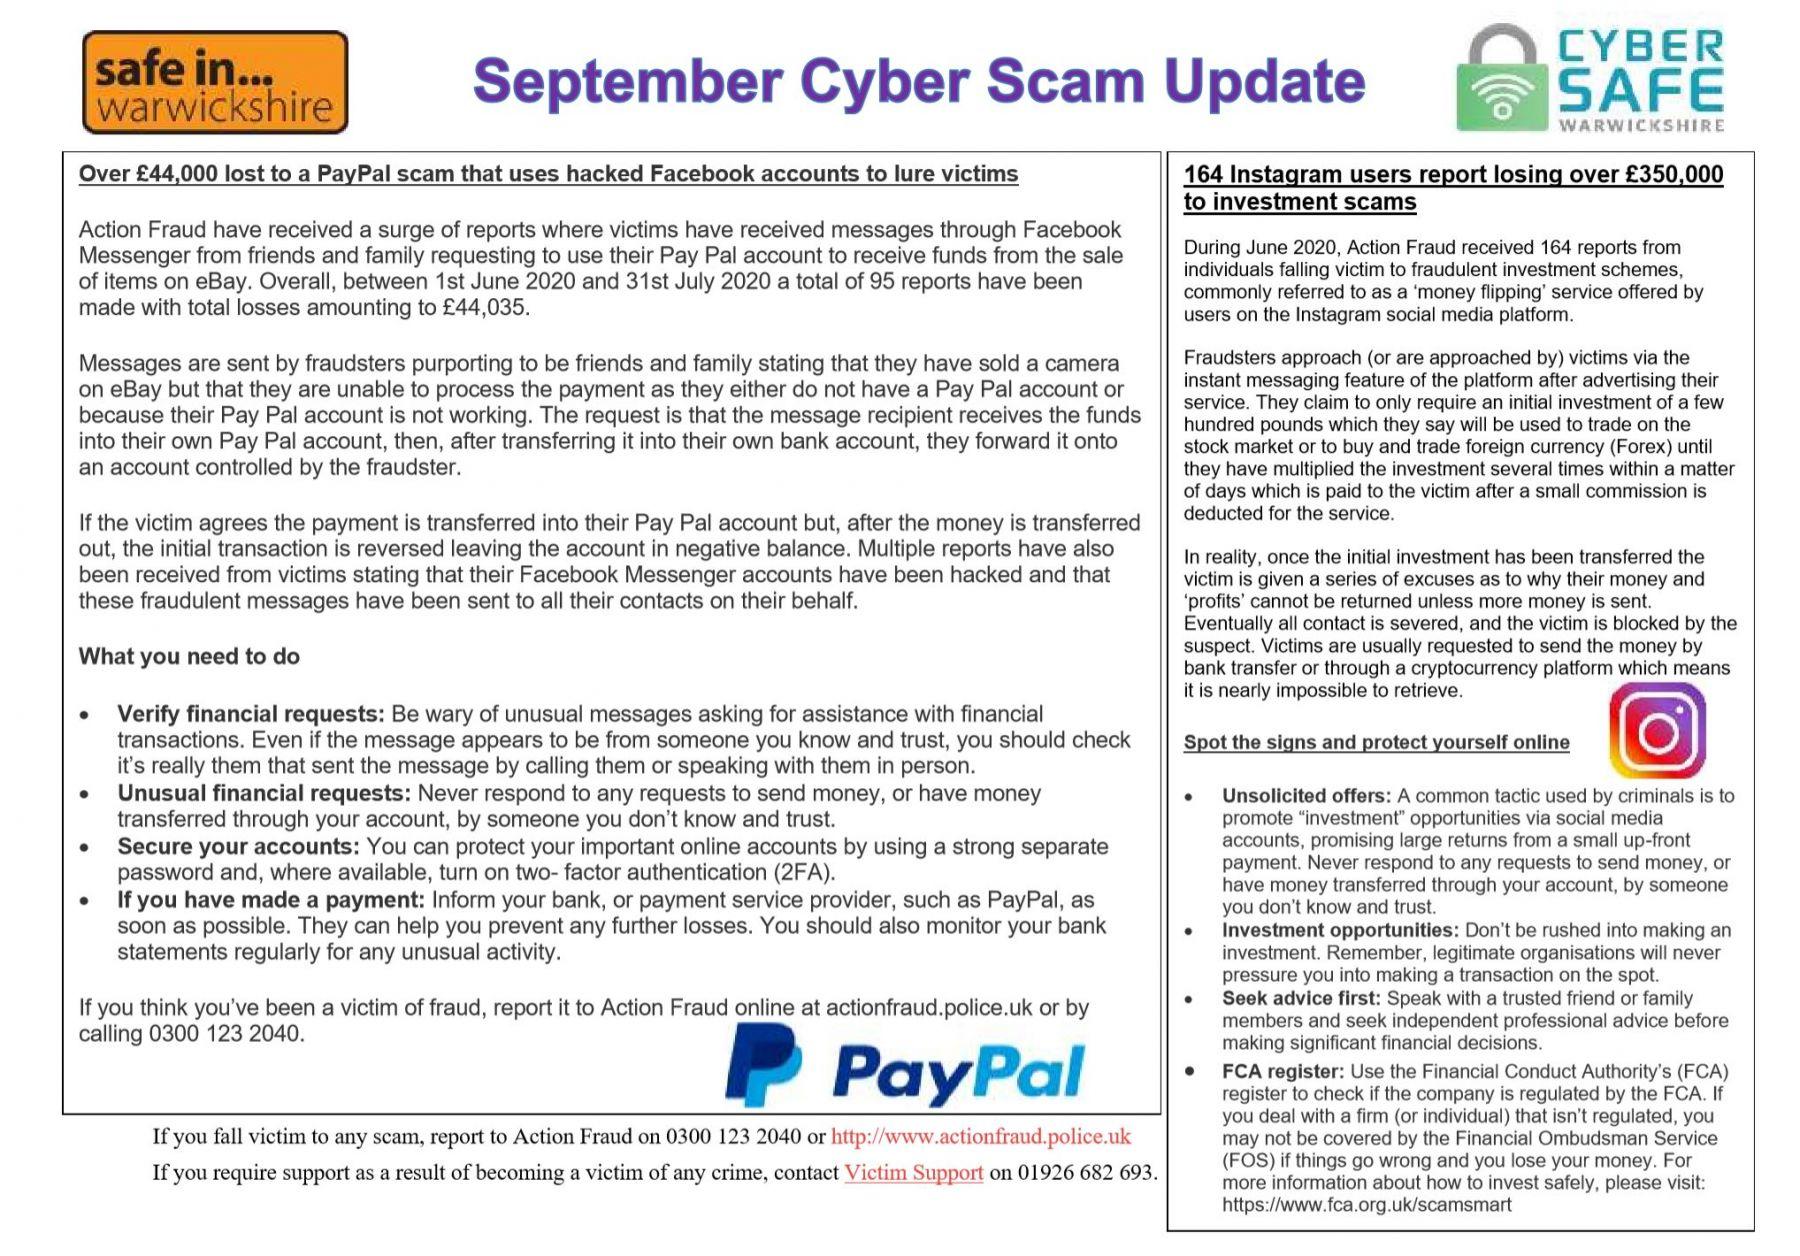 Cyber Safe Warwickshire September Cyber Scam Newsletter